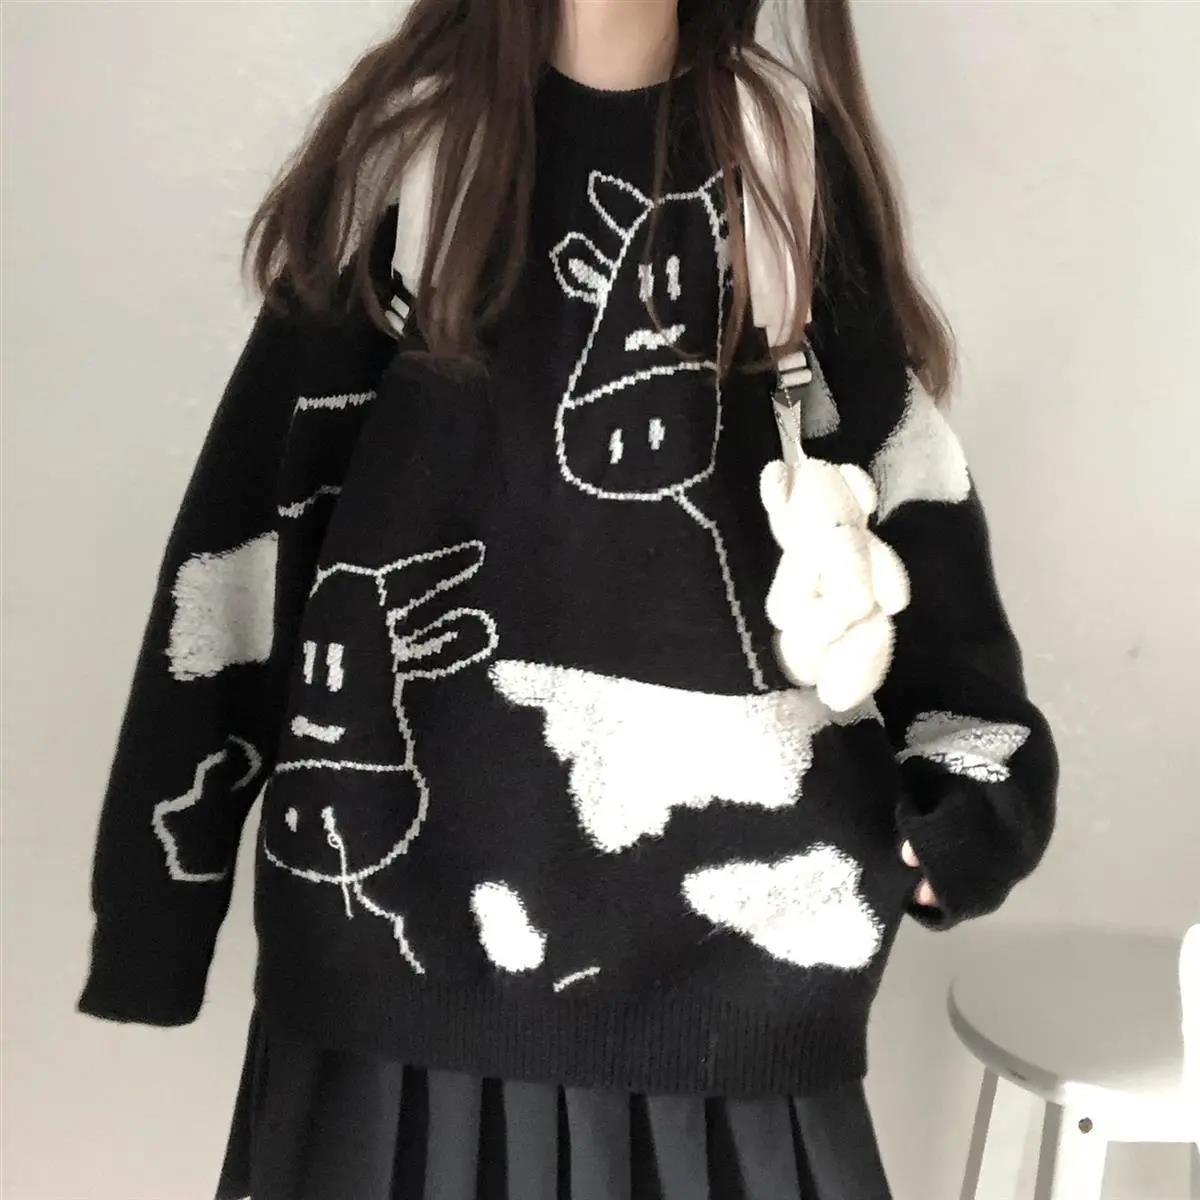 Egirl Harajuku pullover with a cow print 48